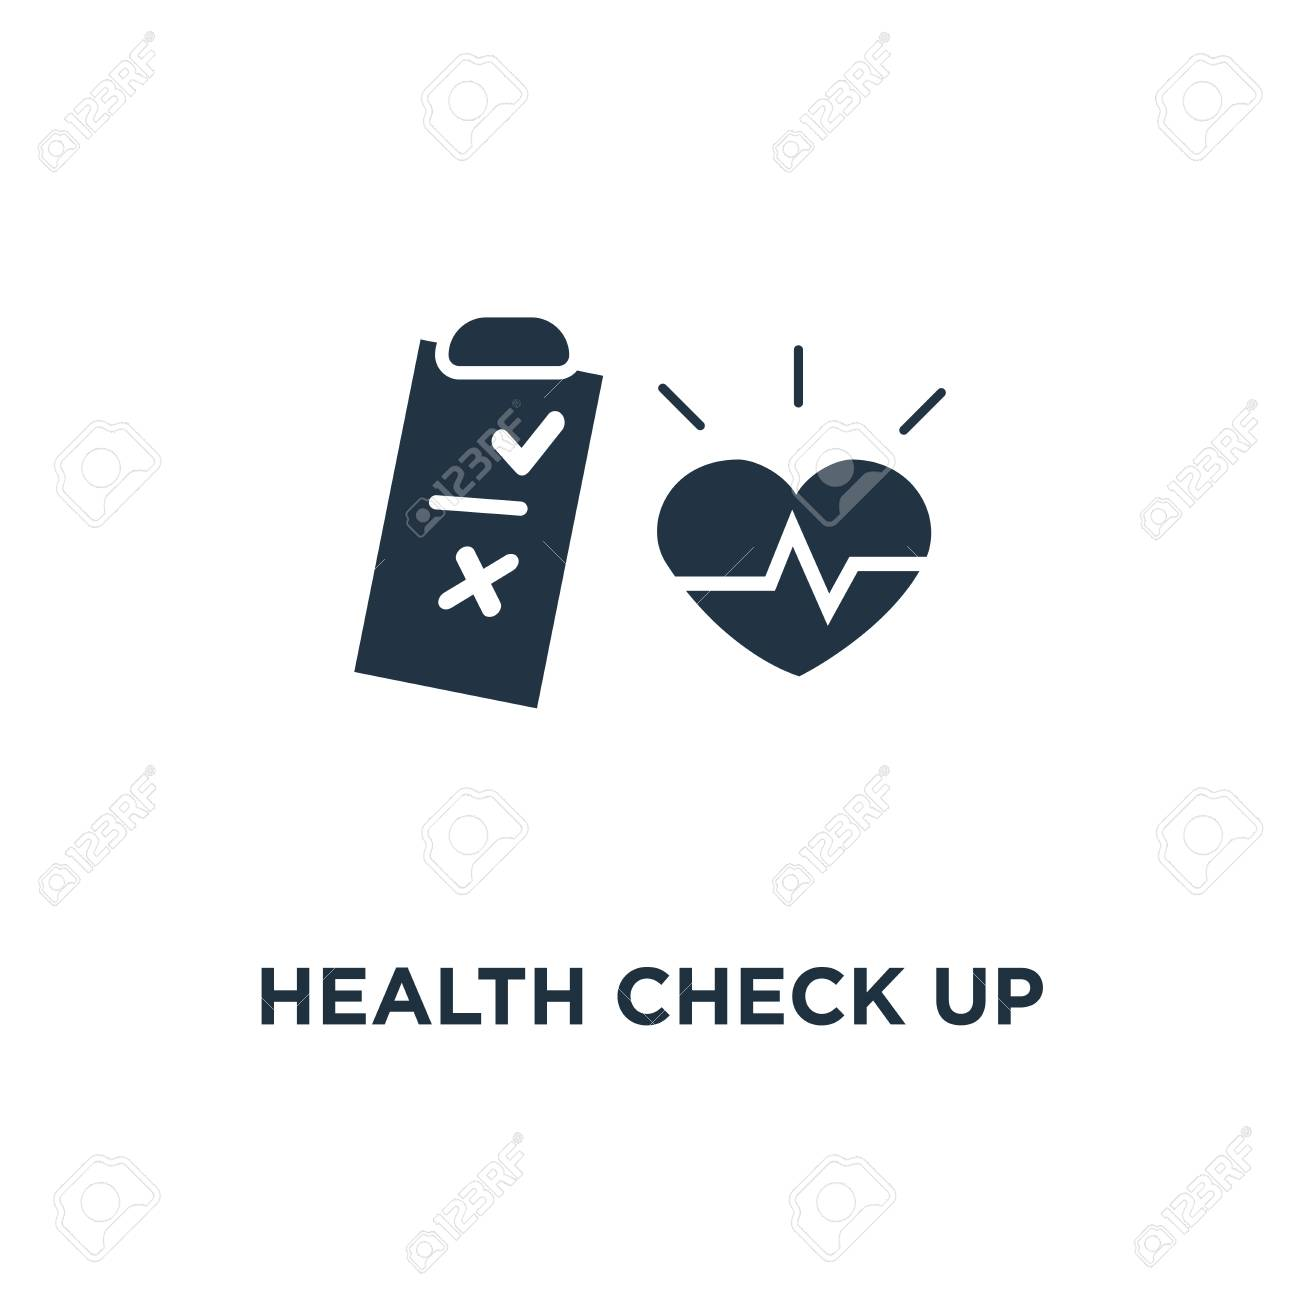 health check up checklist icon  cardiovascular disease prevention